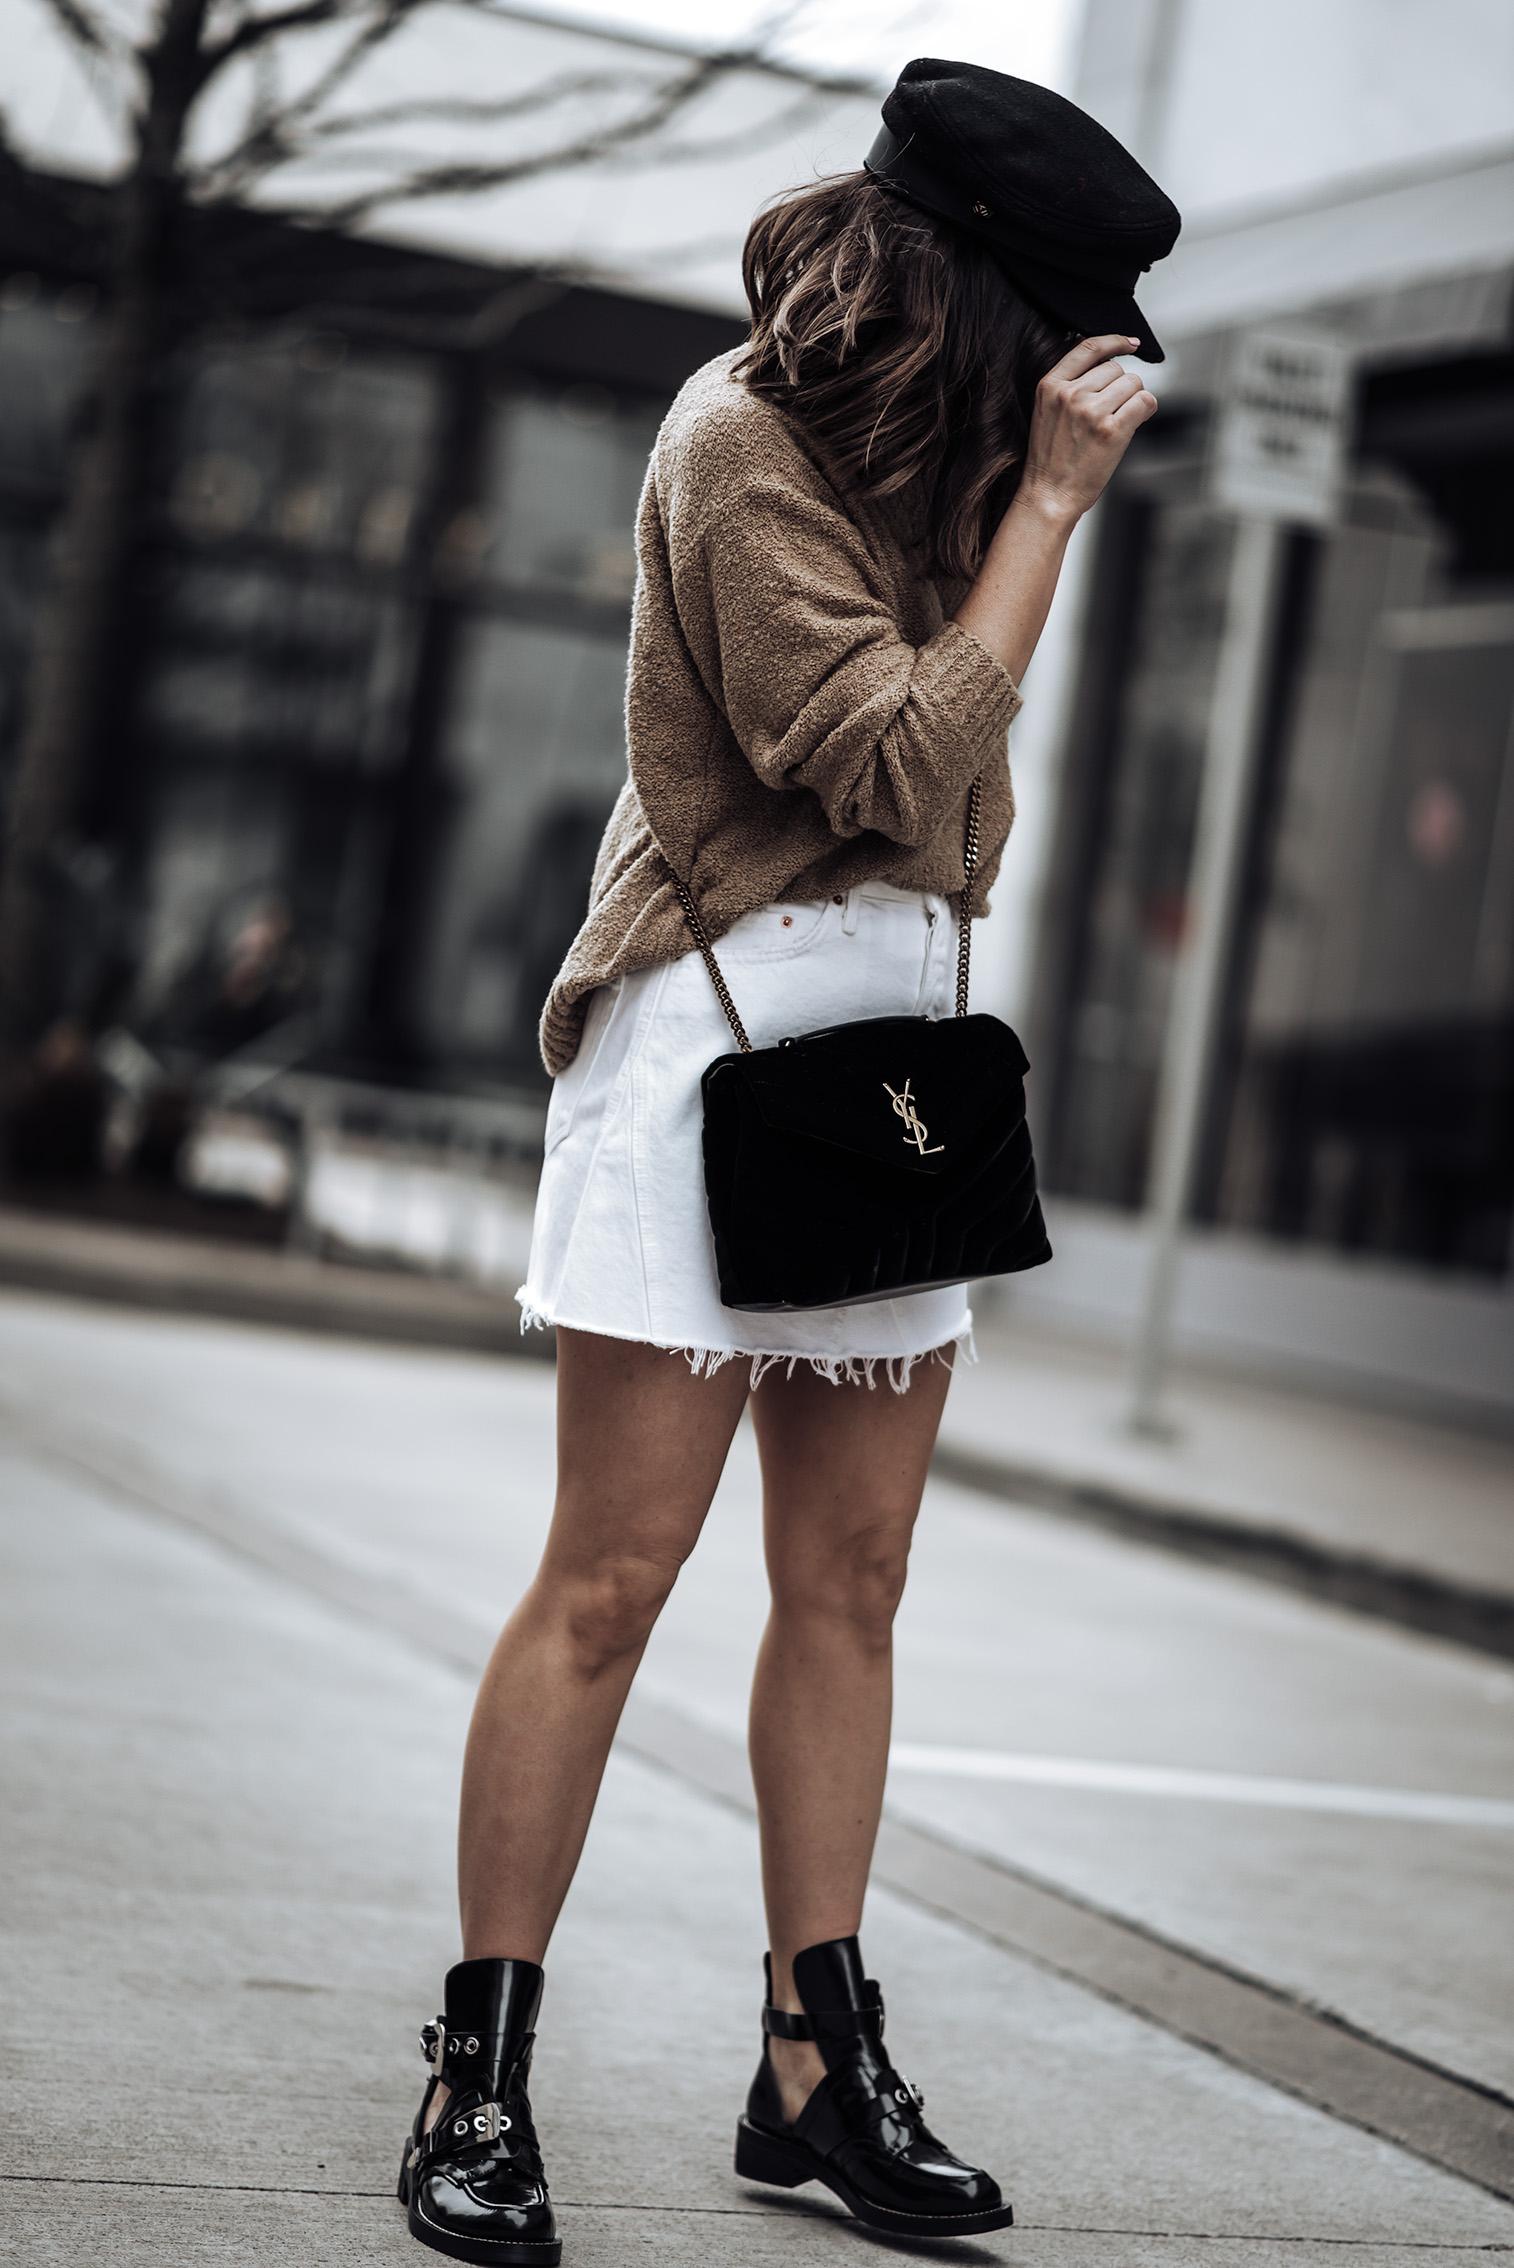 Combat boot trend | #streetstyle #blog #liketkit {C/O}GRLFRND Denim Eva A- Frame Skirt | {C/O} House of Harlow 1960 x REVOLVE Renee Pullover | Saint Laurent Small Black LouLou Velvet Bag | Bakers Cap (Similar) |Balenciaga boots Real vs.Steal)